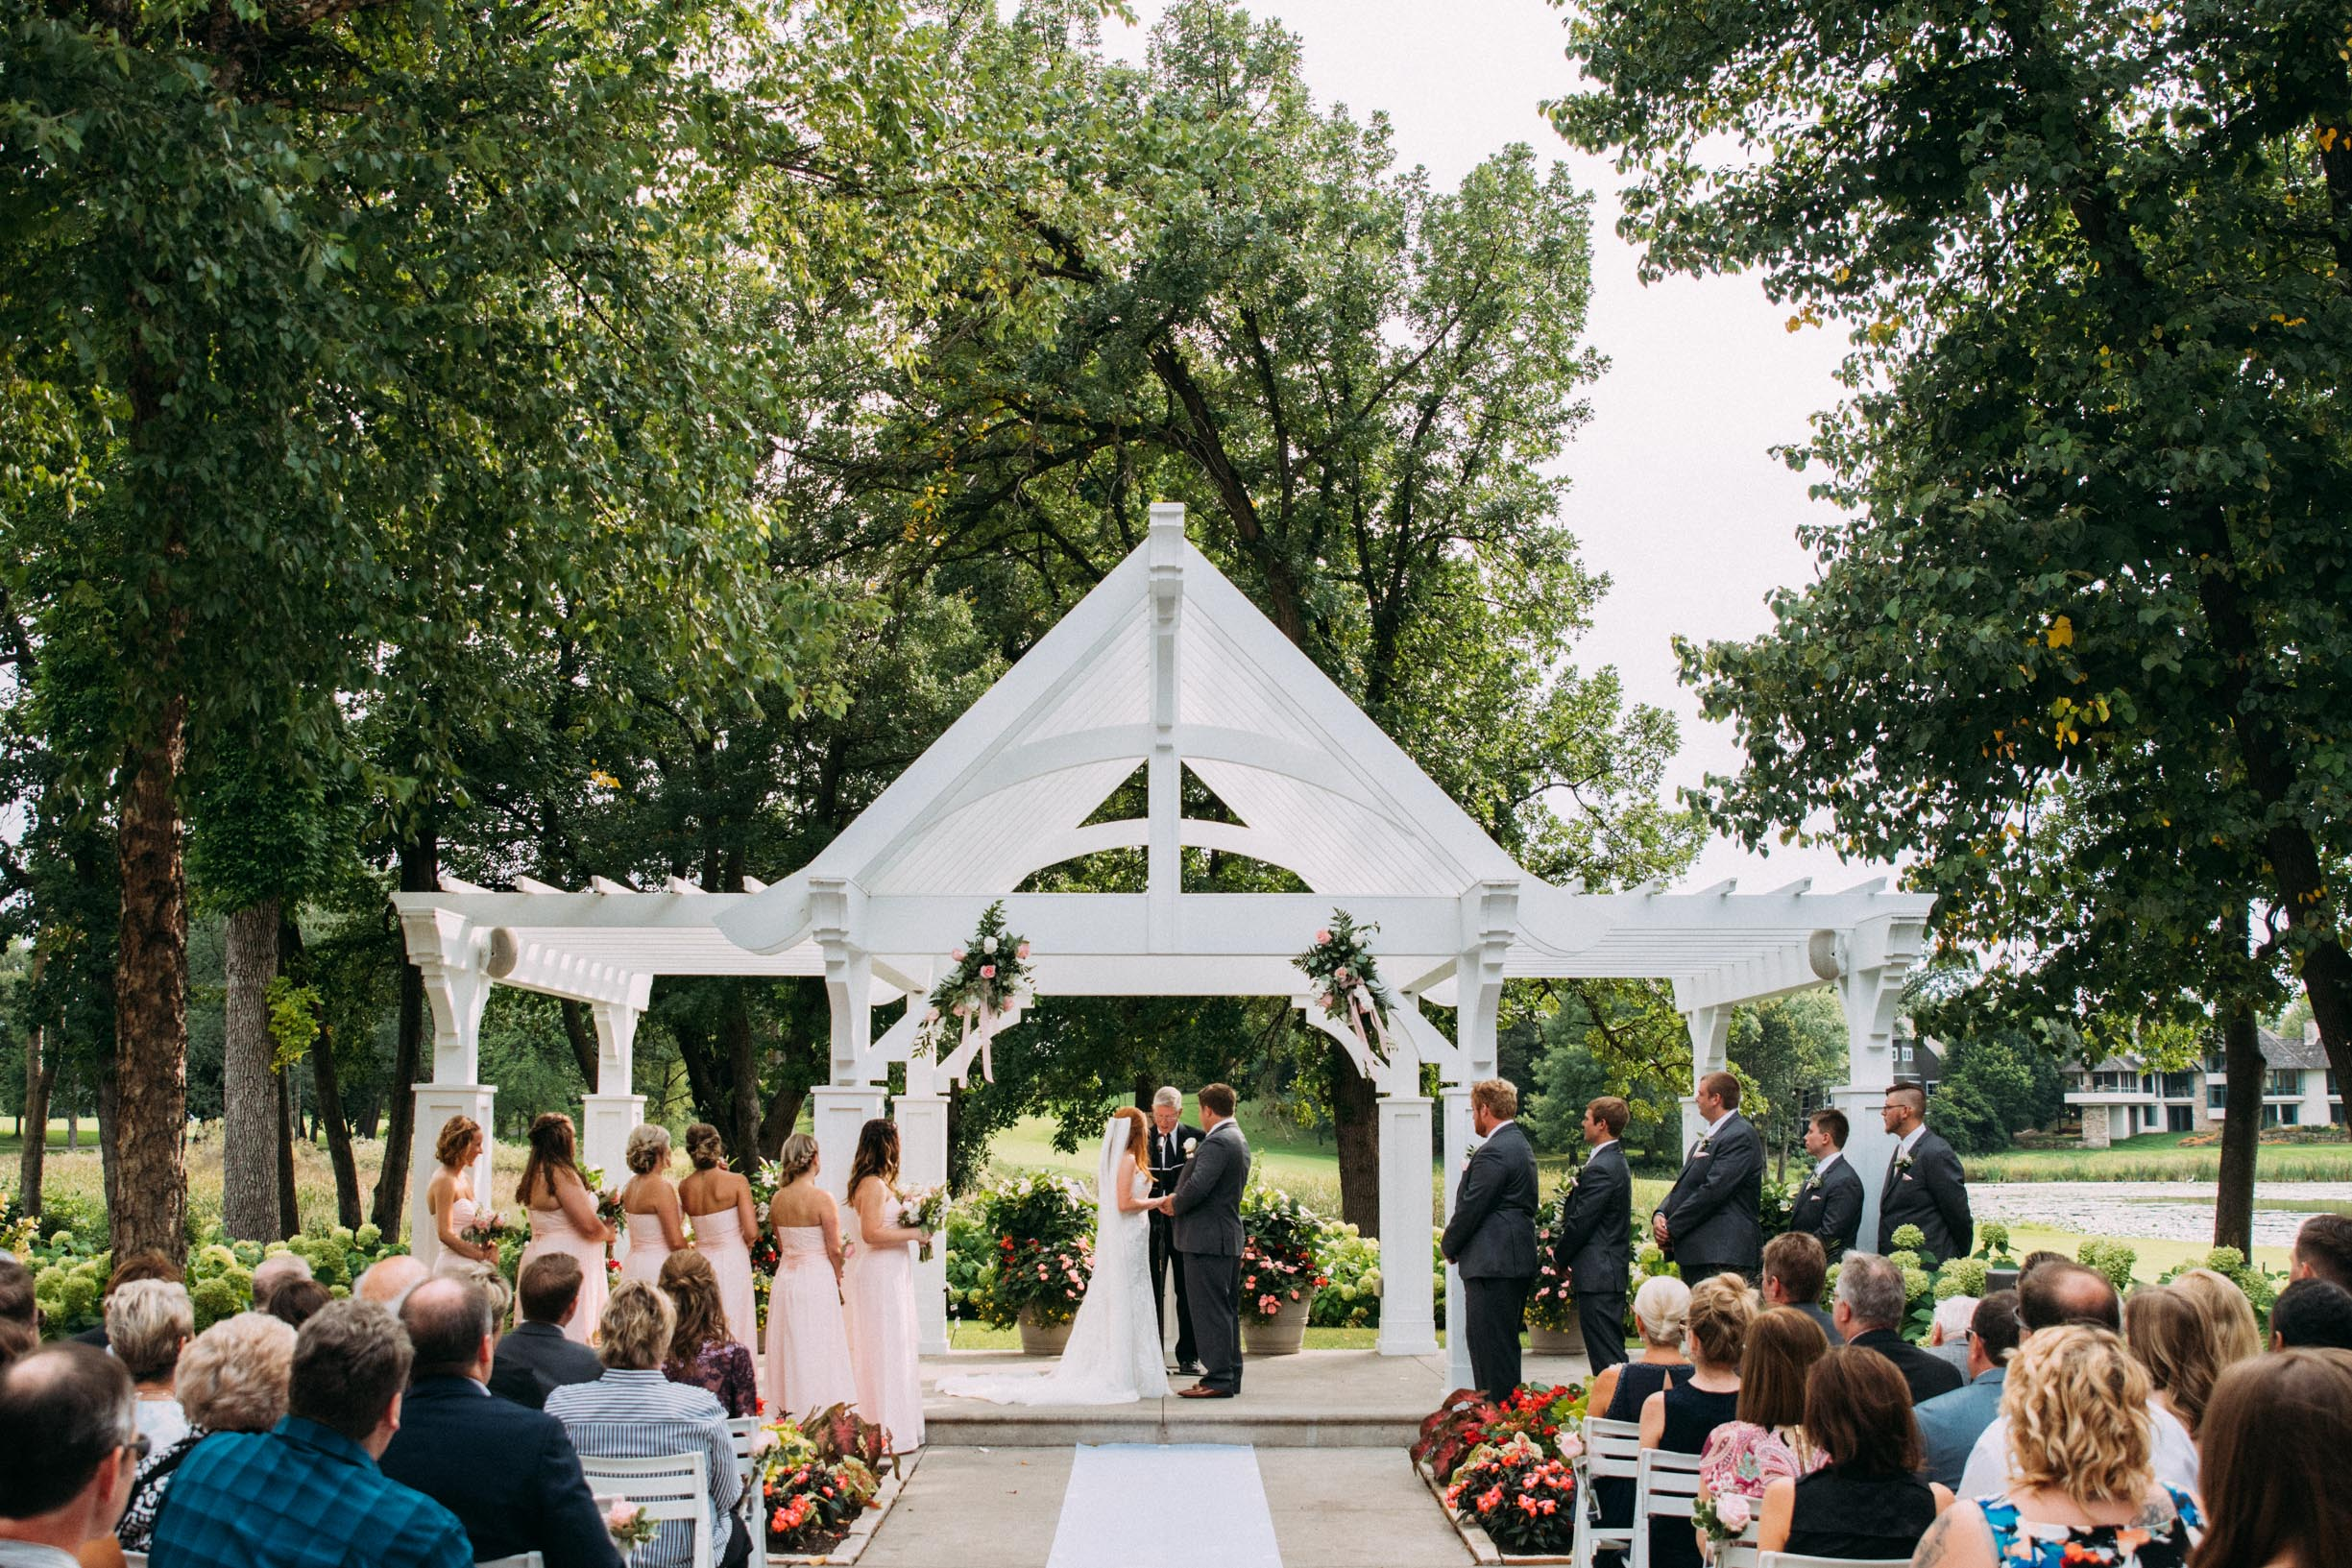 Megan_Zach_Minneapolis_Wedding_Ceremony_Blog-36.jpg